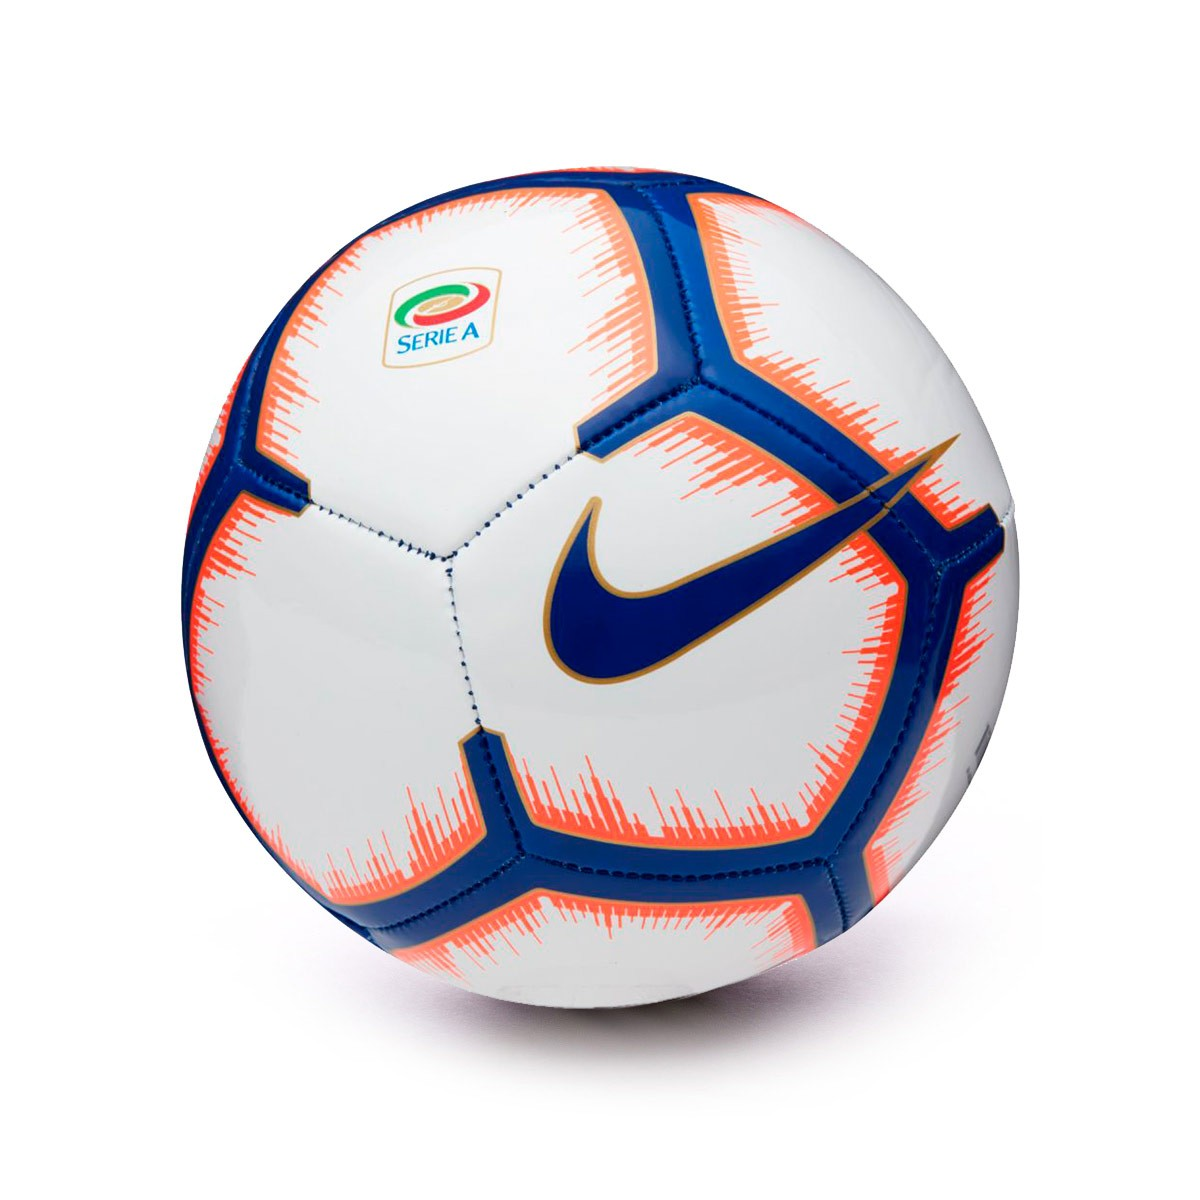 b9c76e907955c Ball Nike Mini Serie A Skills 2018-2019 White-Bright mango-Royal ...